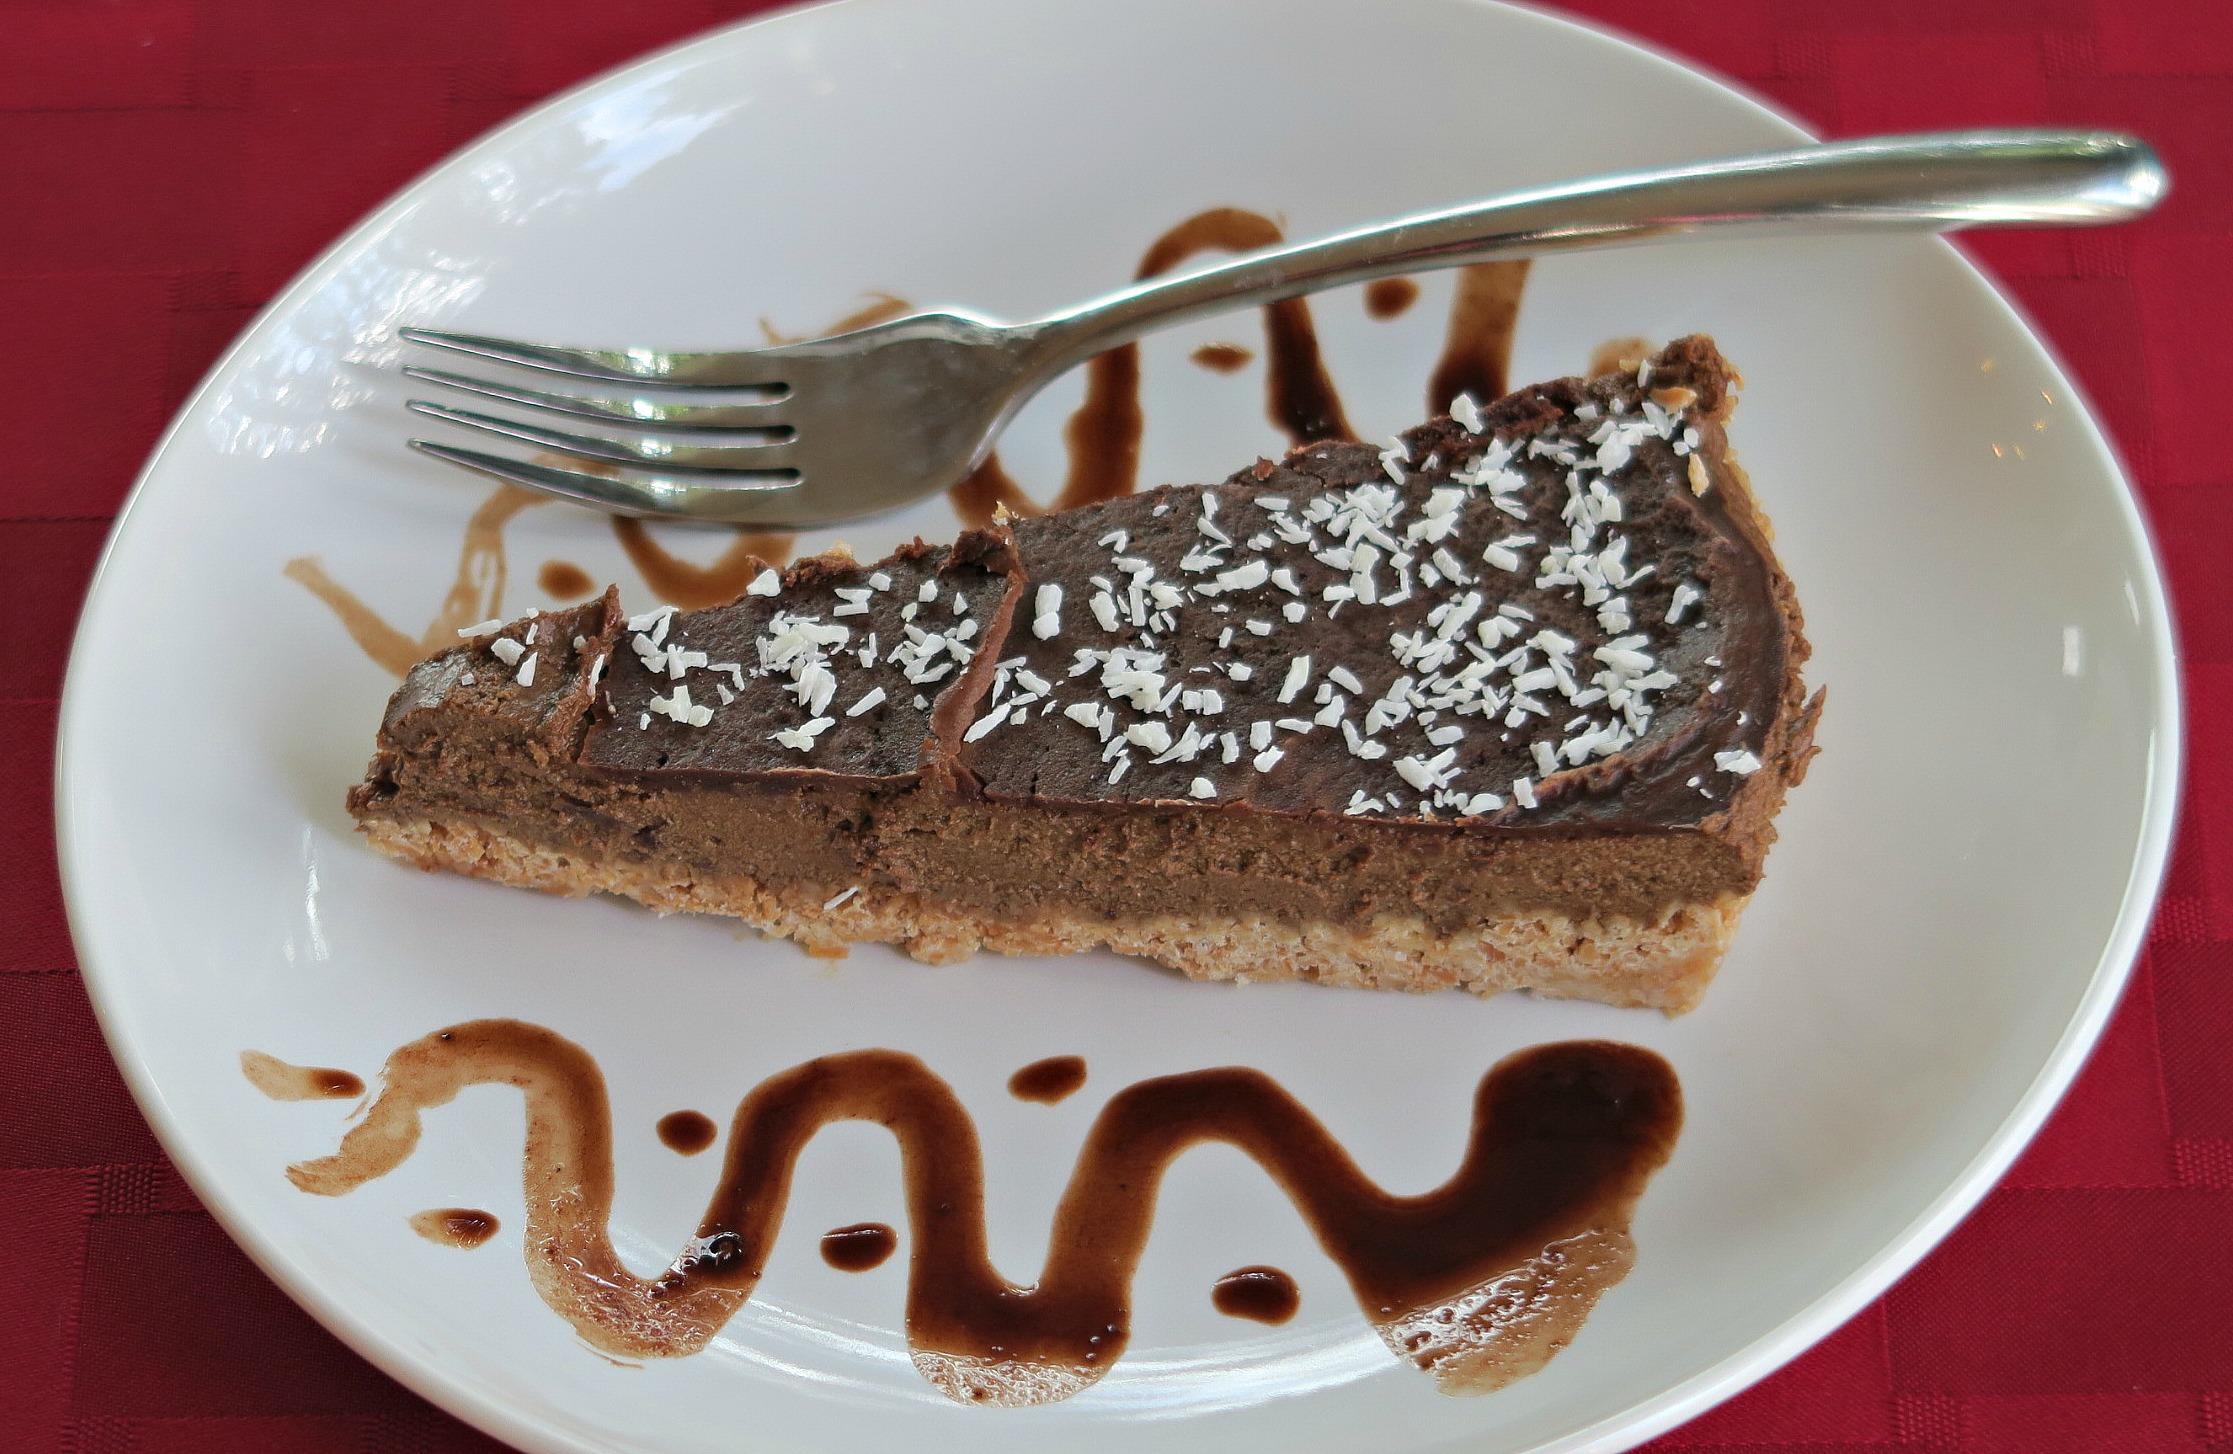 coconut-chocolate-mousse-pie1.jpg